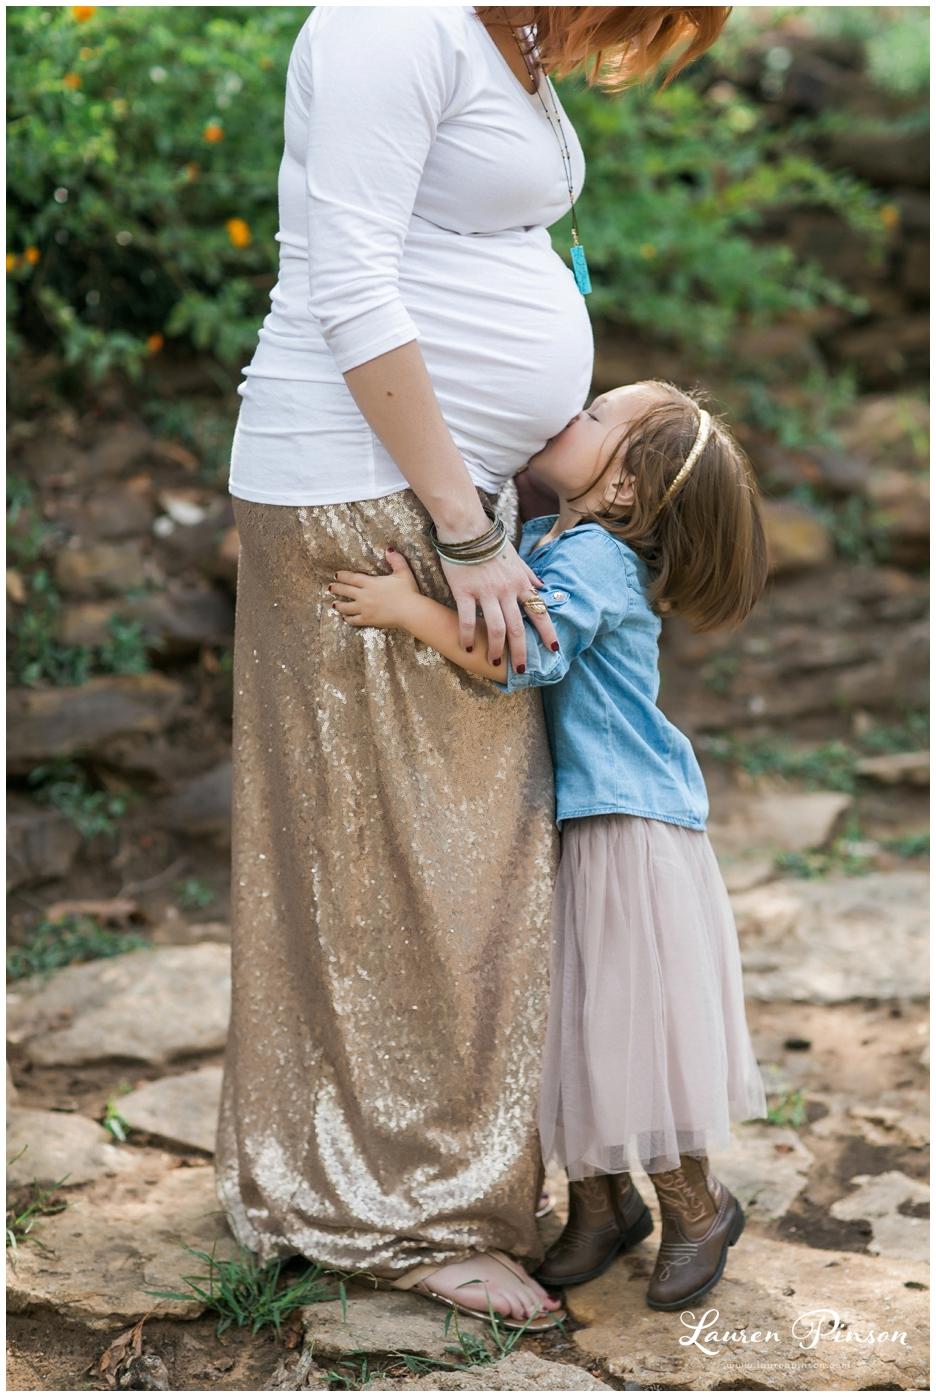 wichita-falls-child-family-portrait-photographer_1293.jpg